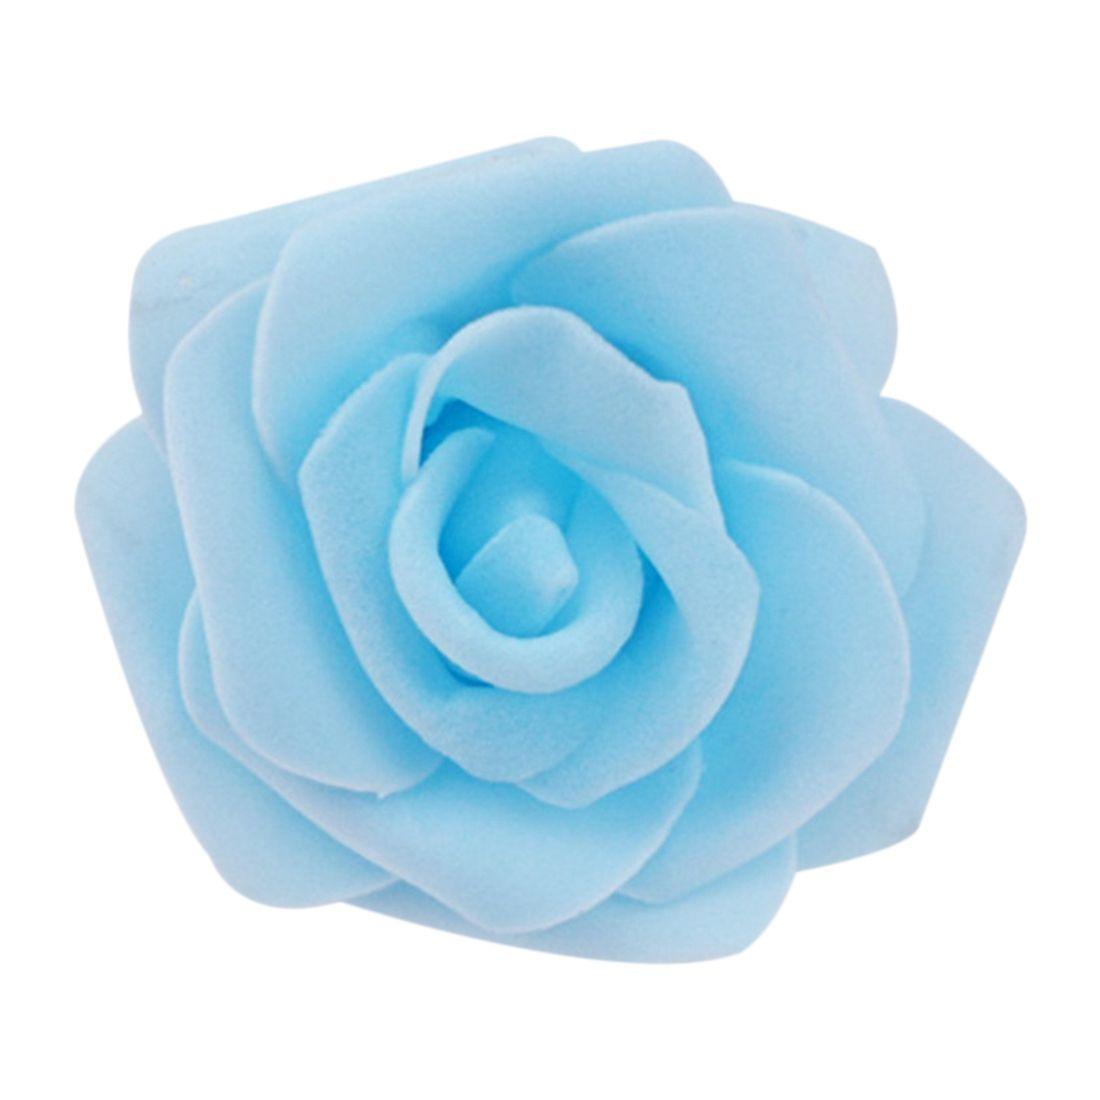 Light Blue Flowers For Weddings: ALIM High Quality 100pcs / Bag 6cm Foam Rose Heads